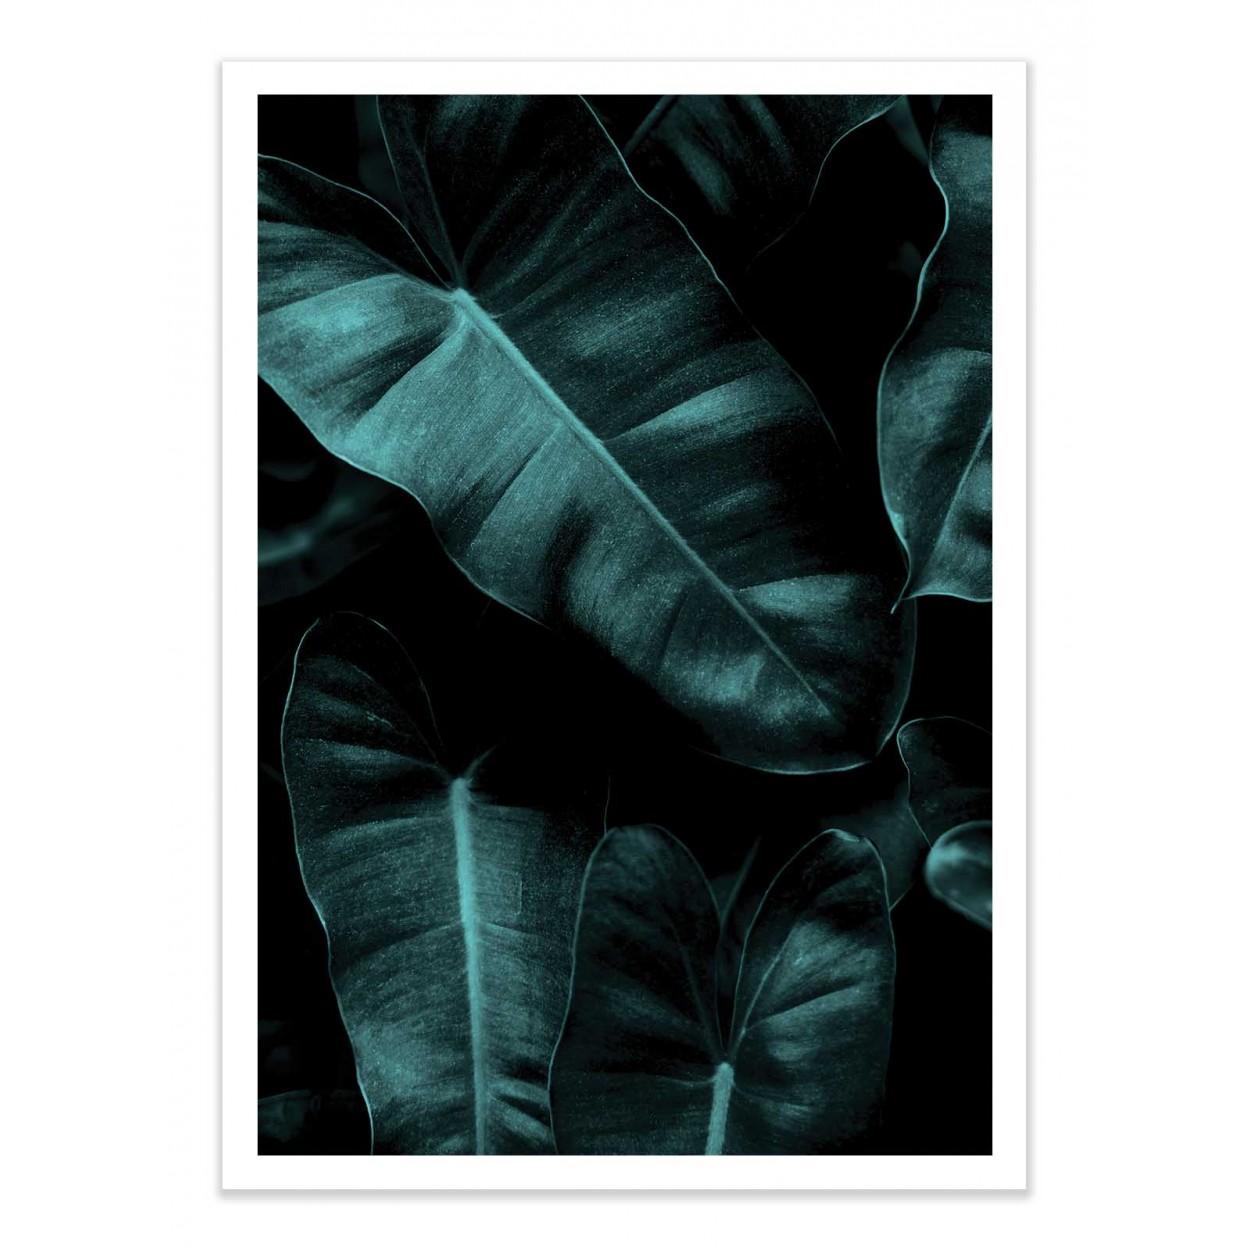 THE BEACH - KUBISTIKA - Affiche d'art 50 x 70 cm